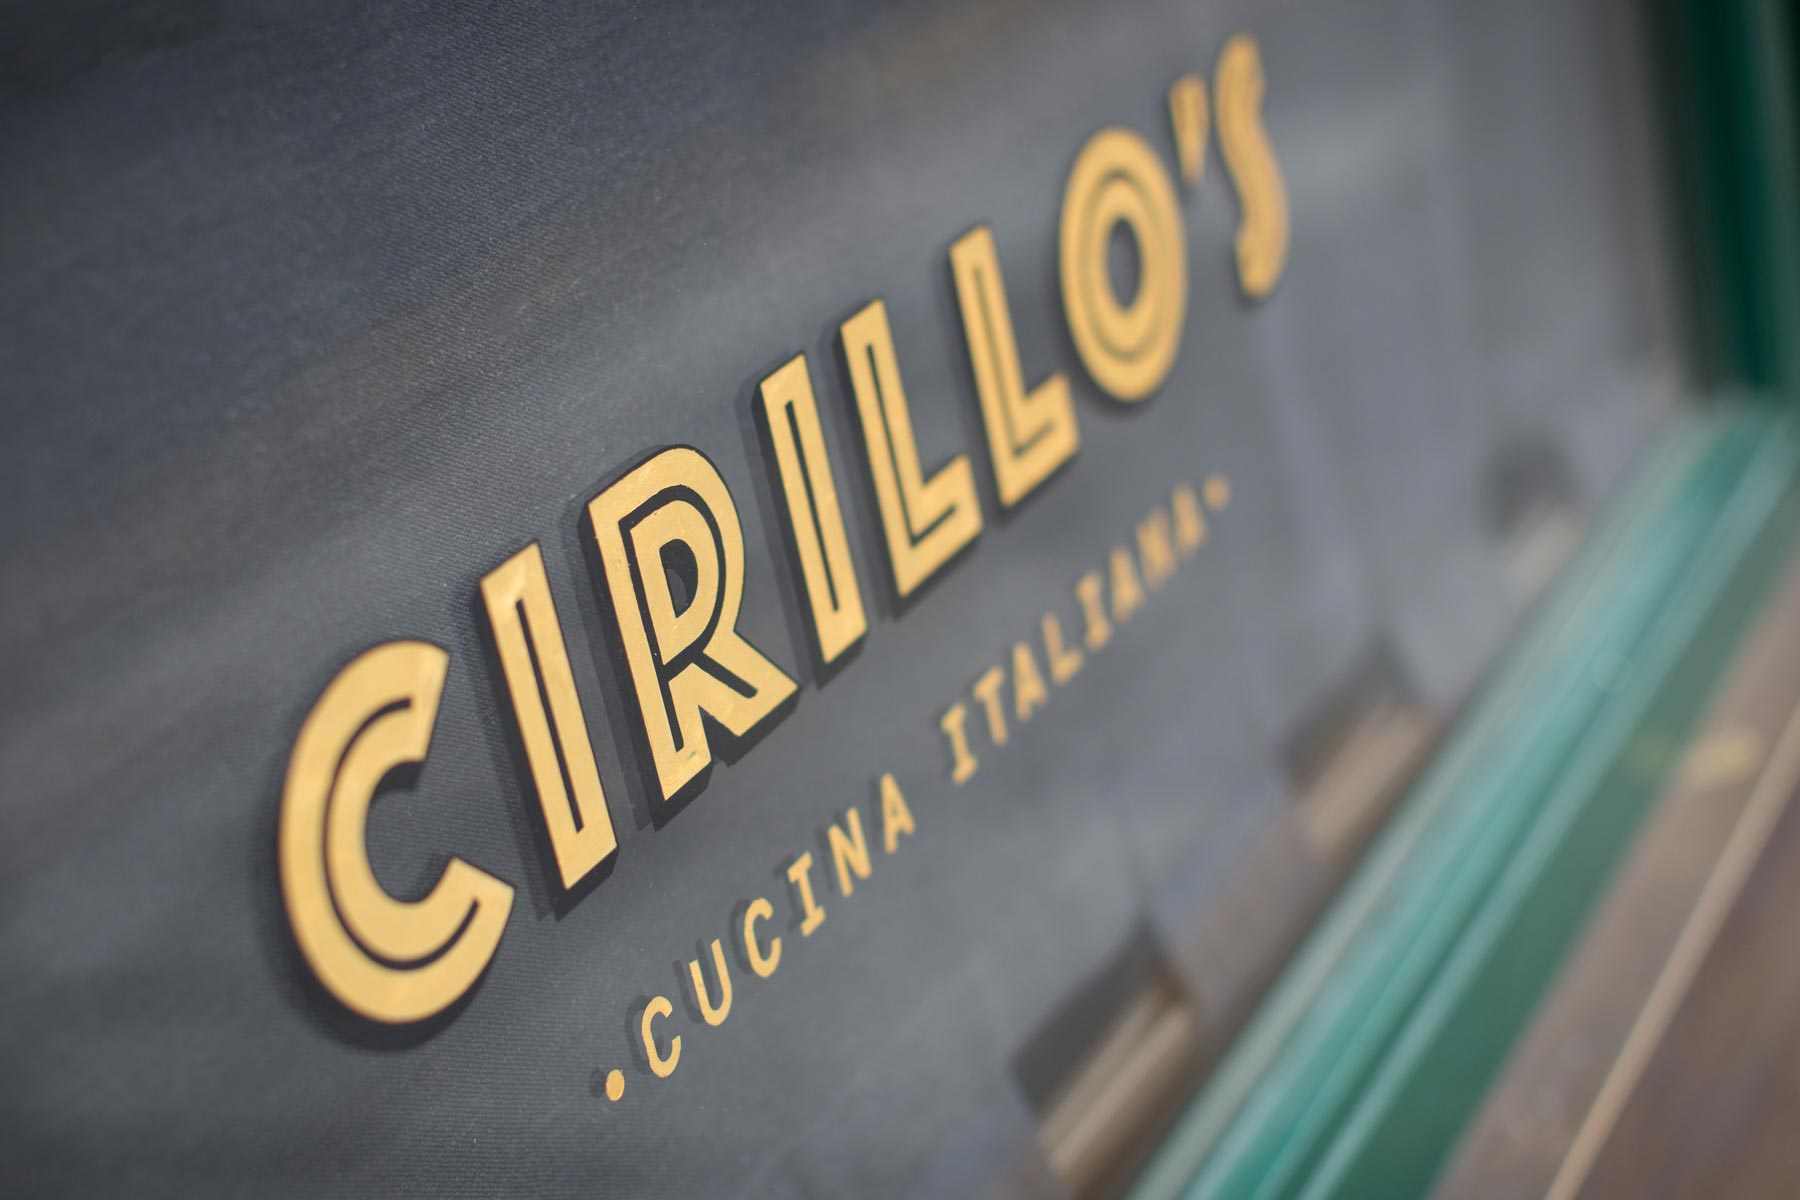 Cirillo's  revert design